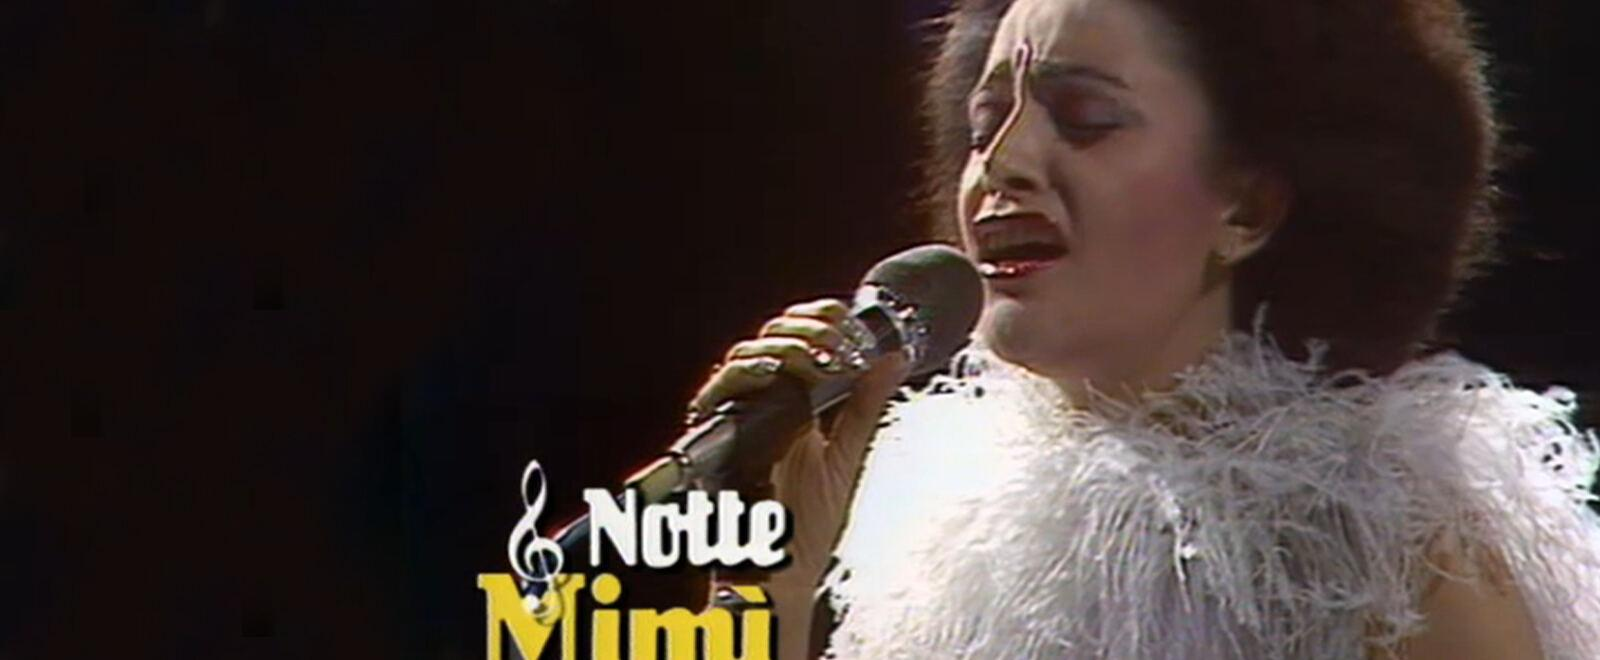 Notte mimi' '99